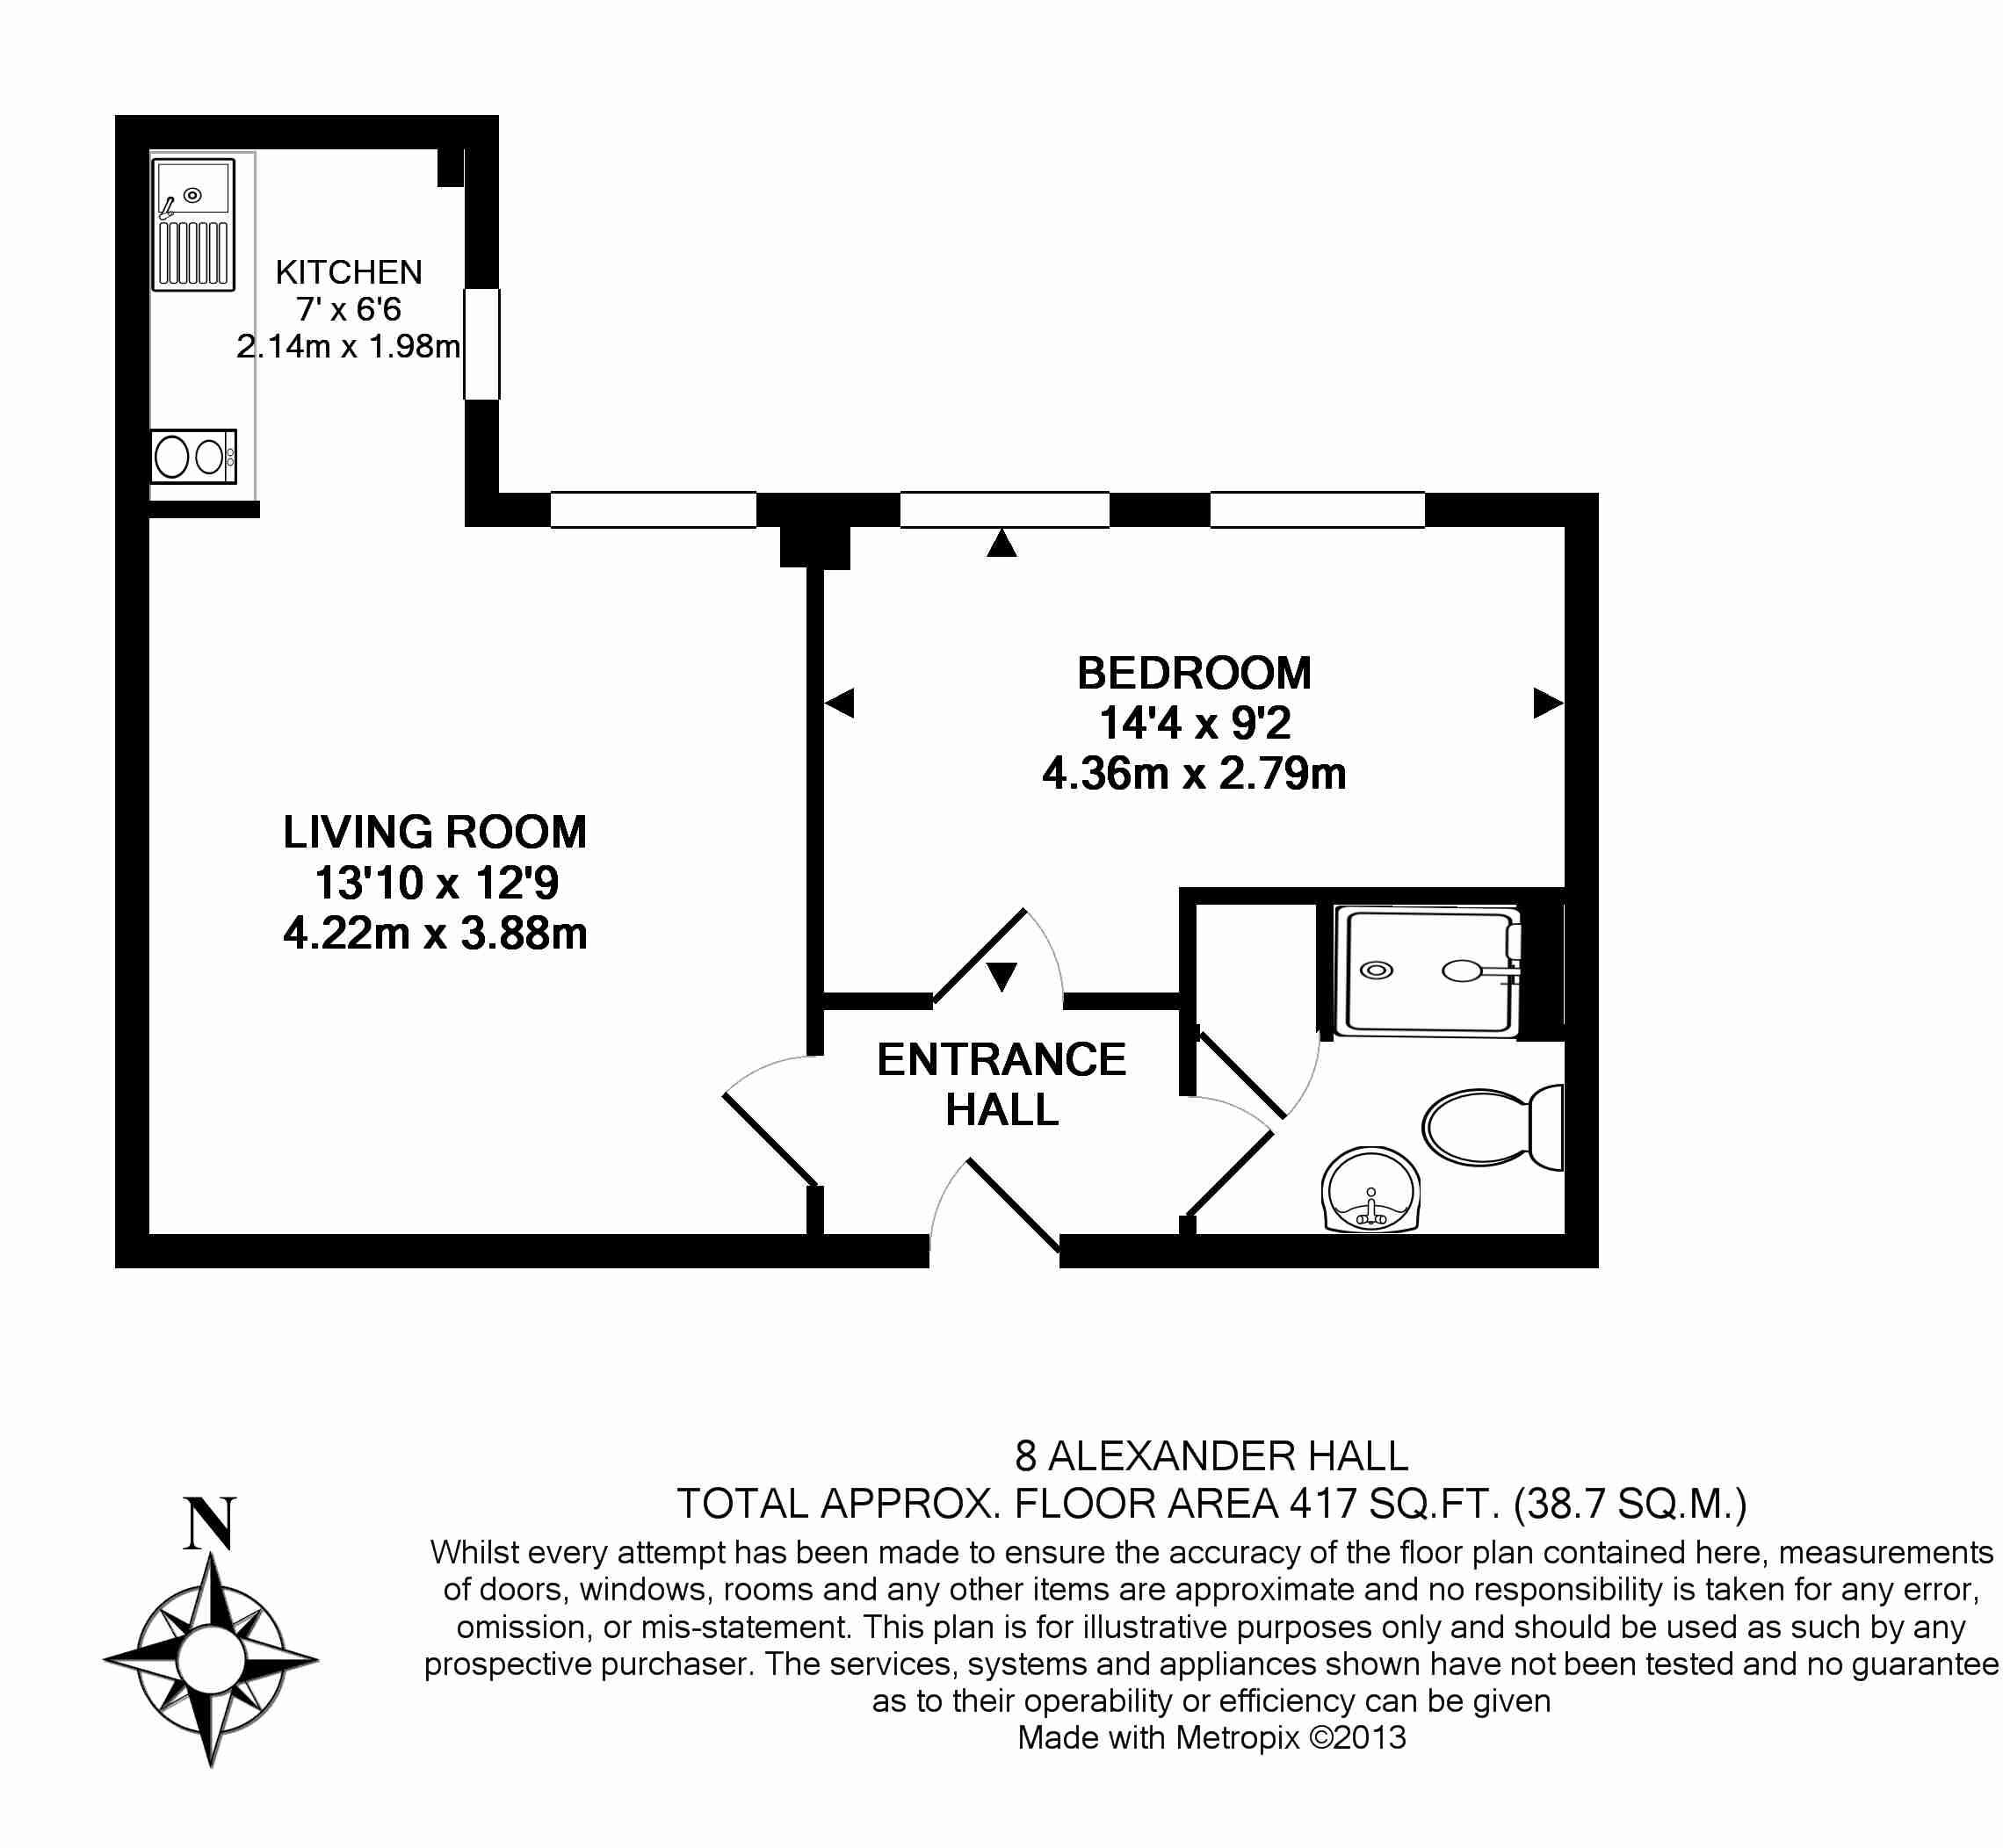 08 Alexander Hall Floorplan